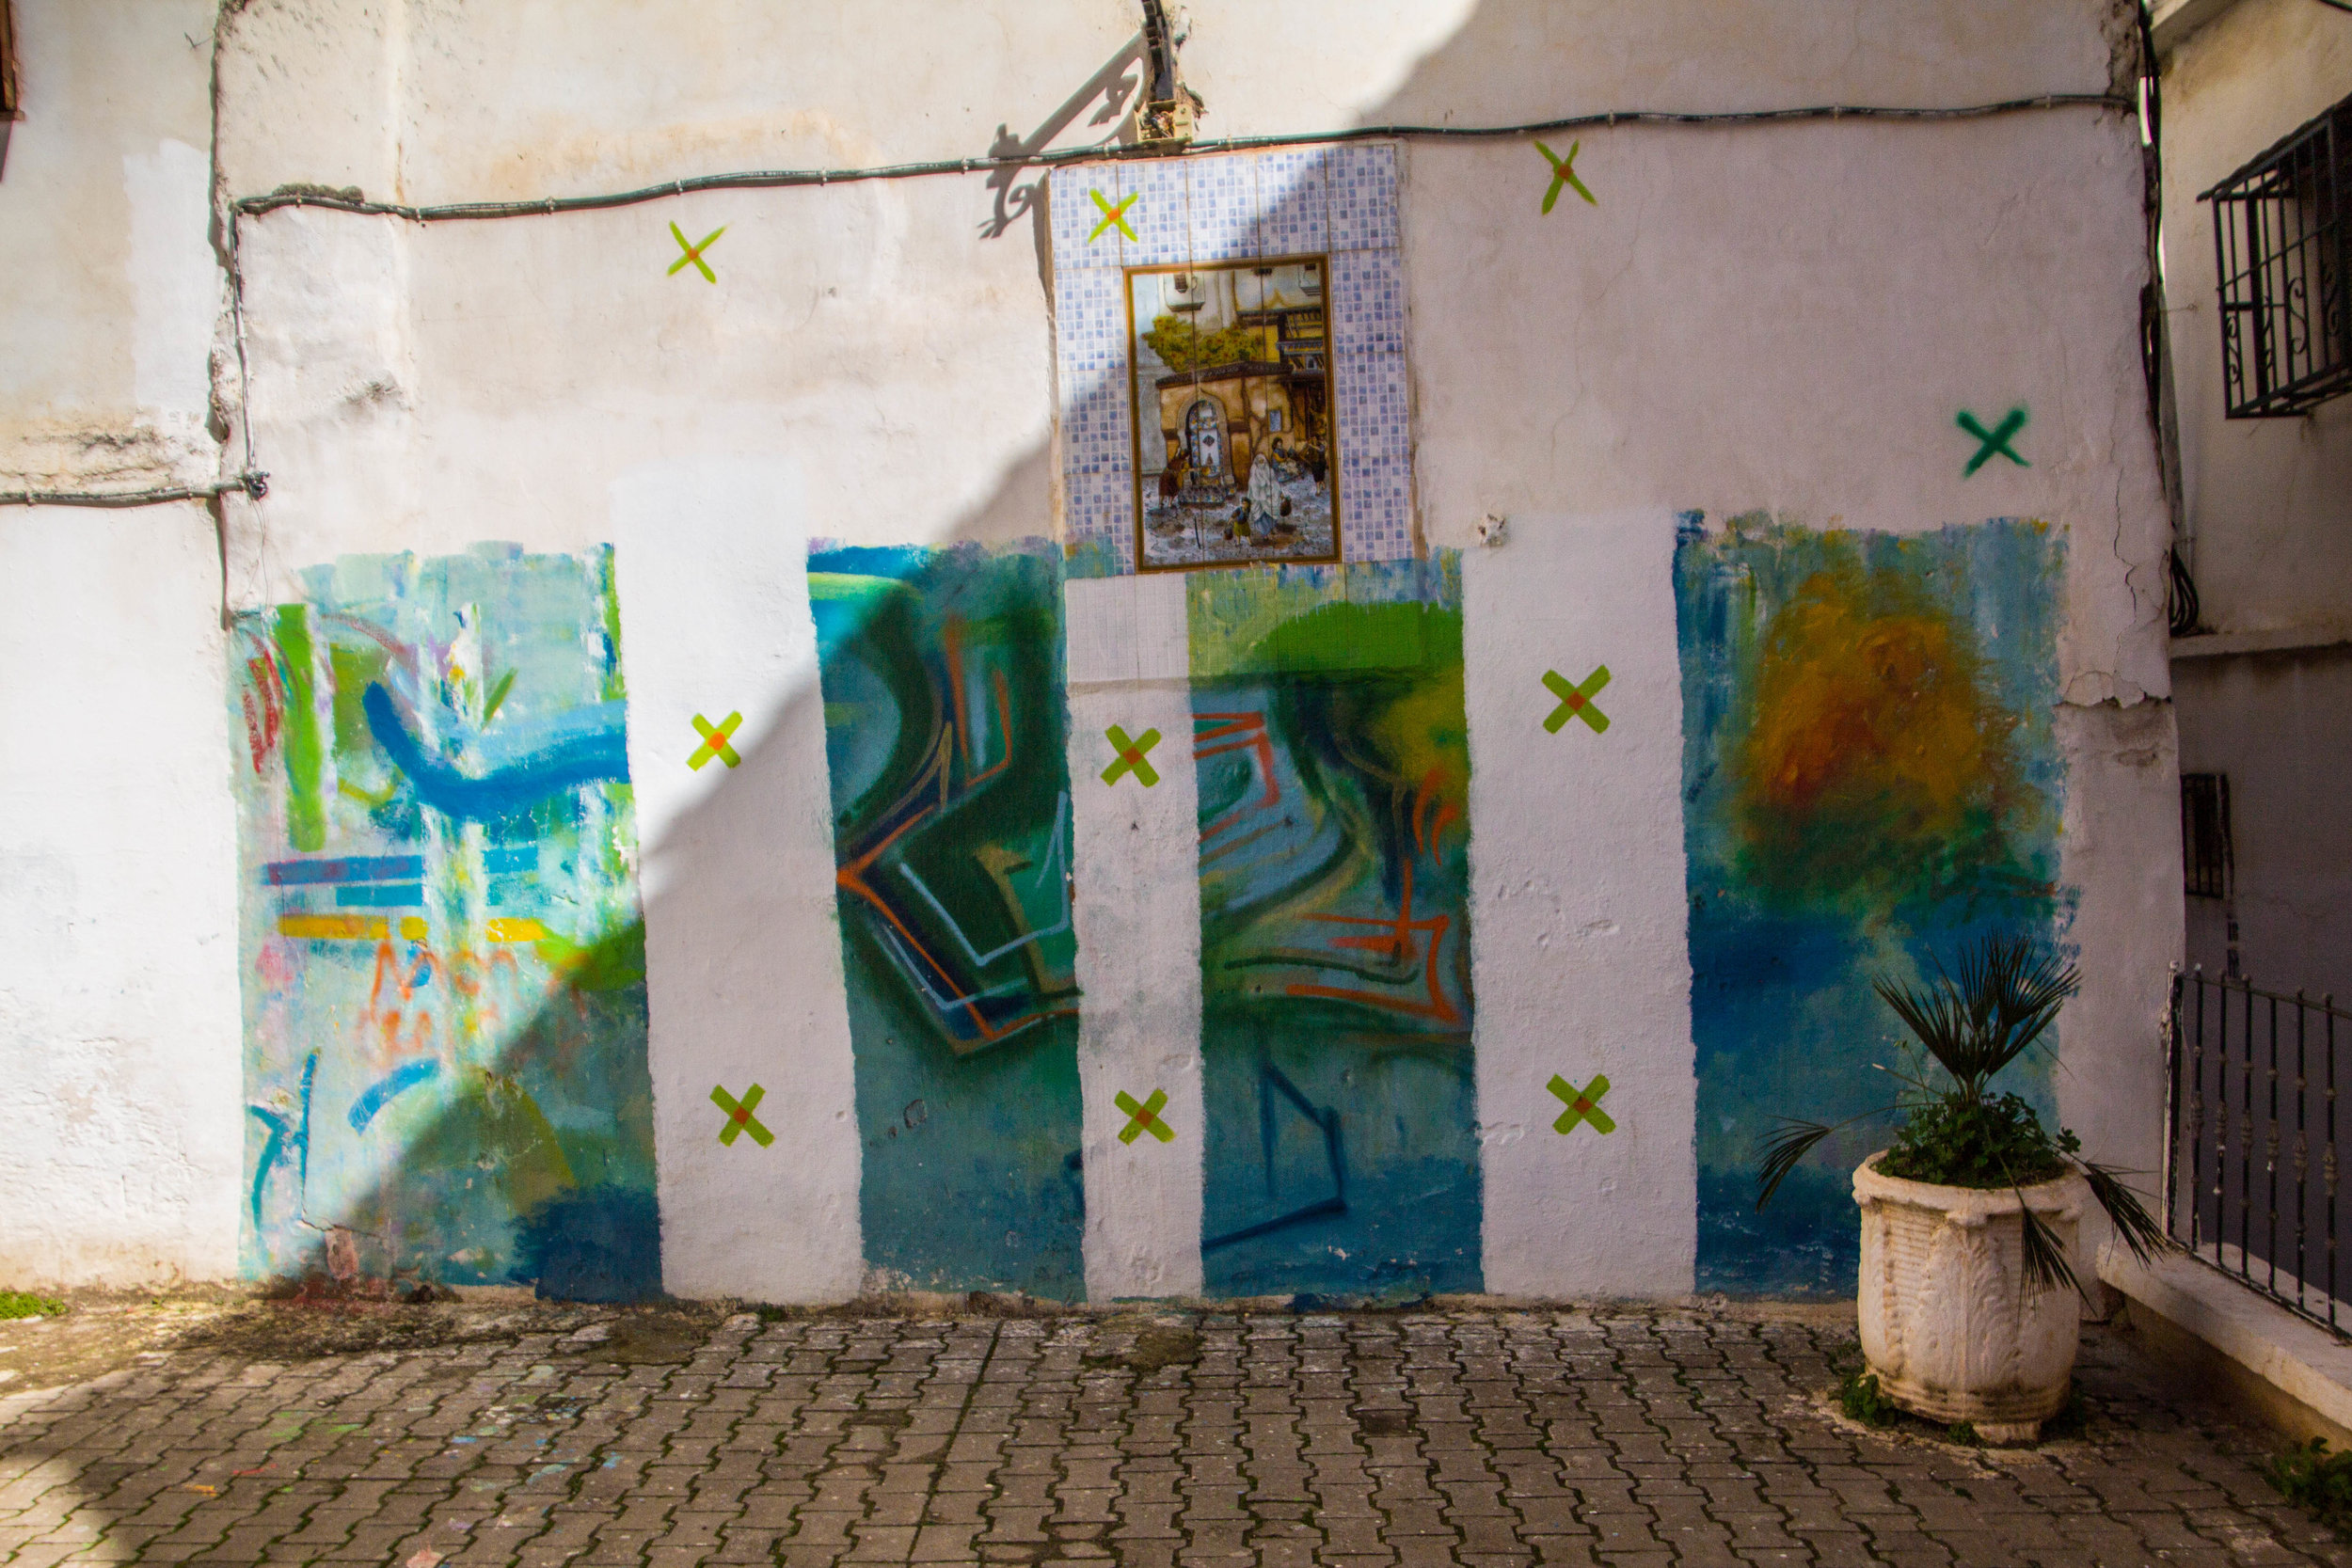 casbah-photography-algiers-algeria-alger-36.jpg